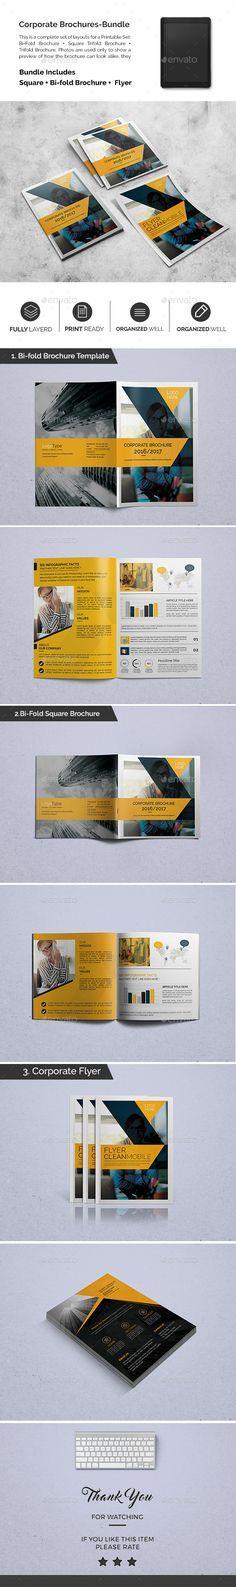 Corporate Brochures Design Bundle 03 - Catalogs Brochure Template PSD. Download here: http://graphicriver.net/item/corporate-brochures-bundle-03/16896919?s_rank=46&ref=yinkira